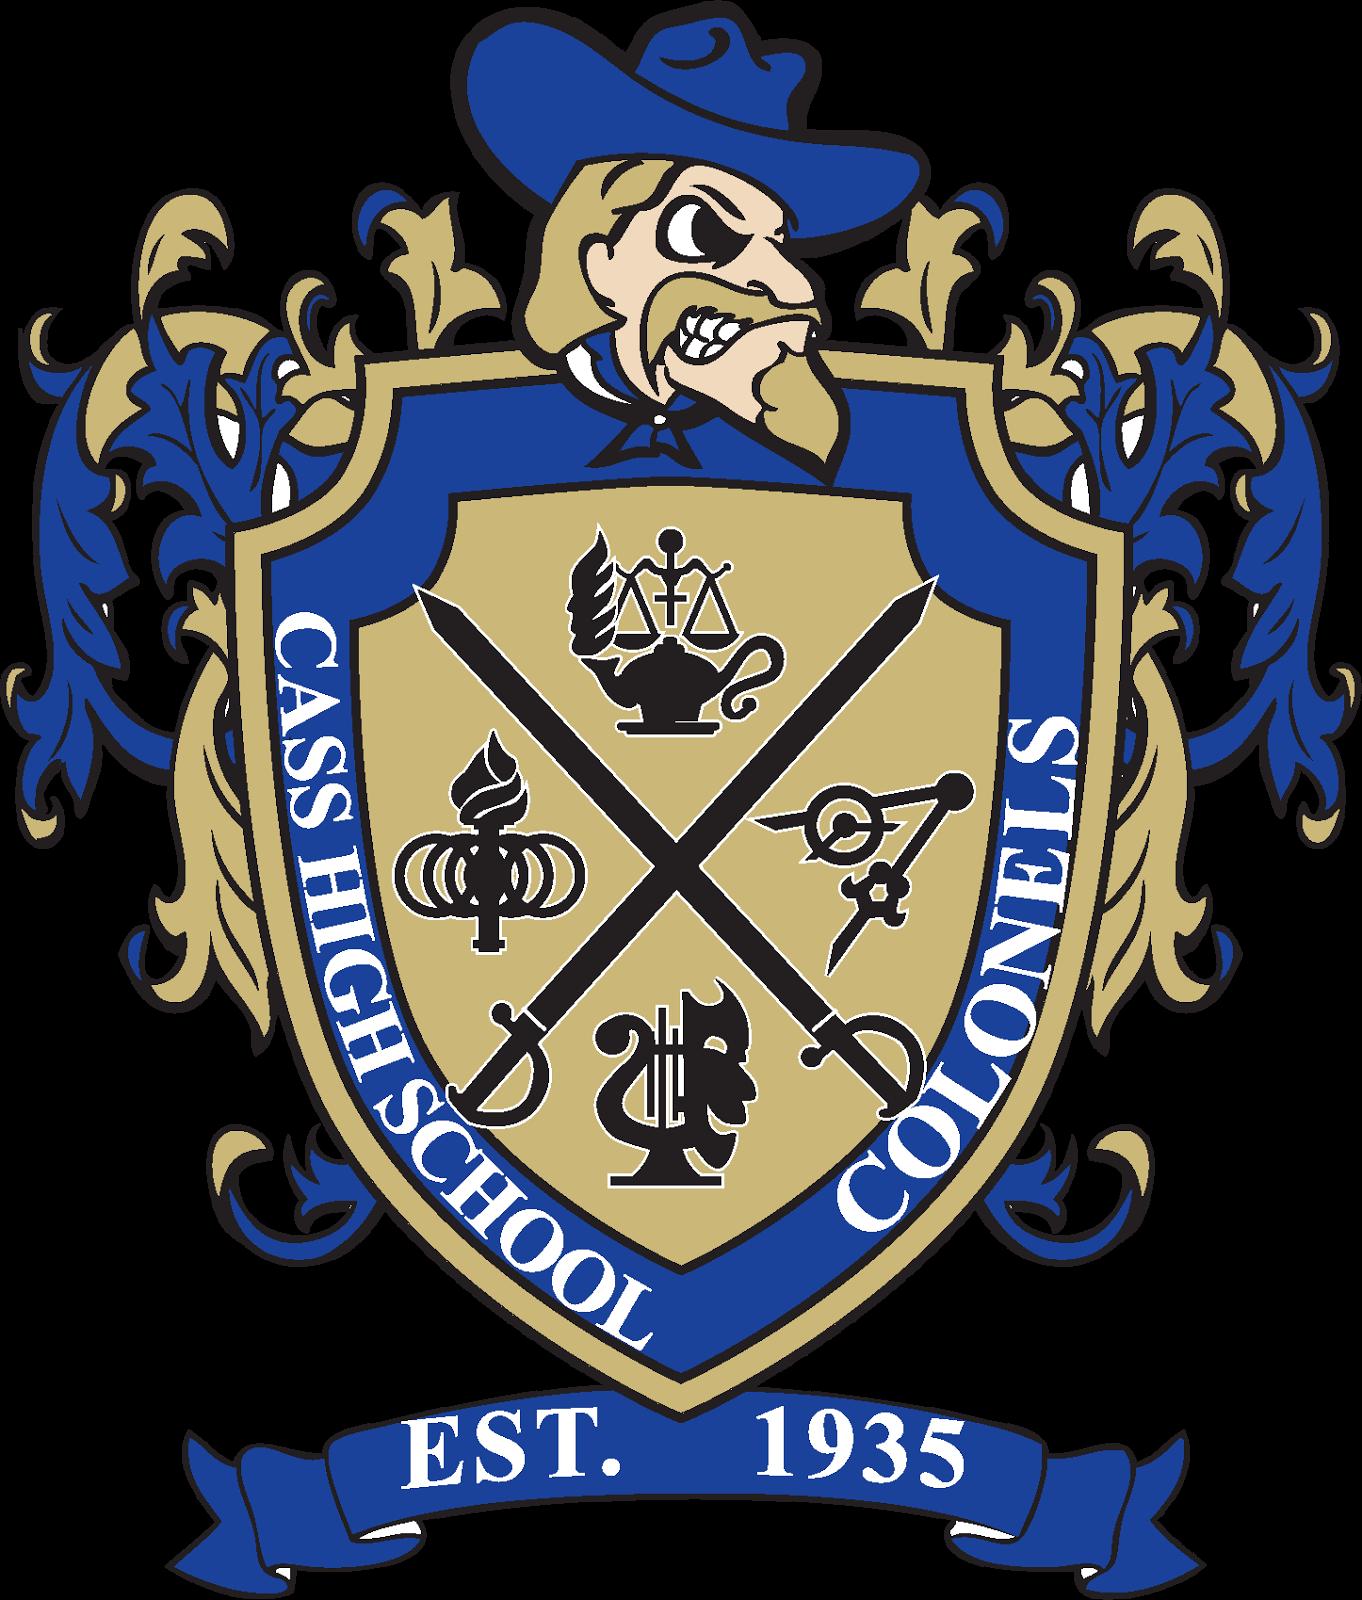 Cass Colonels